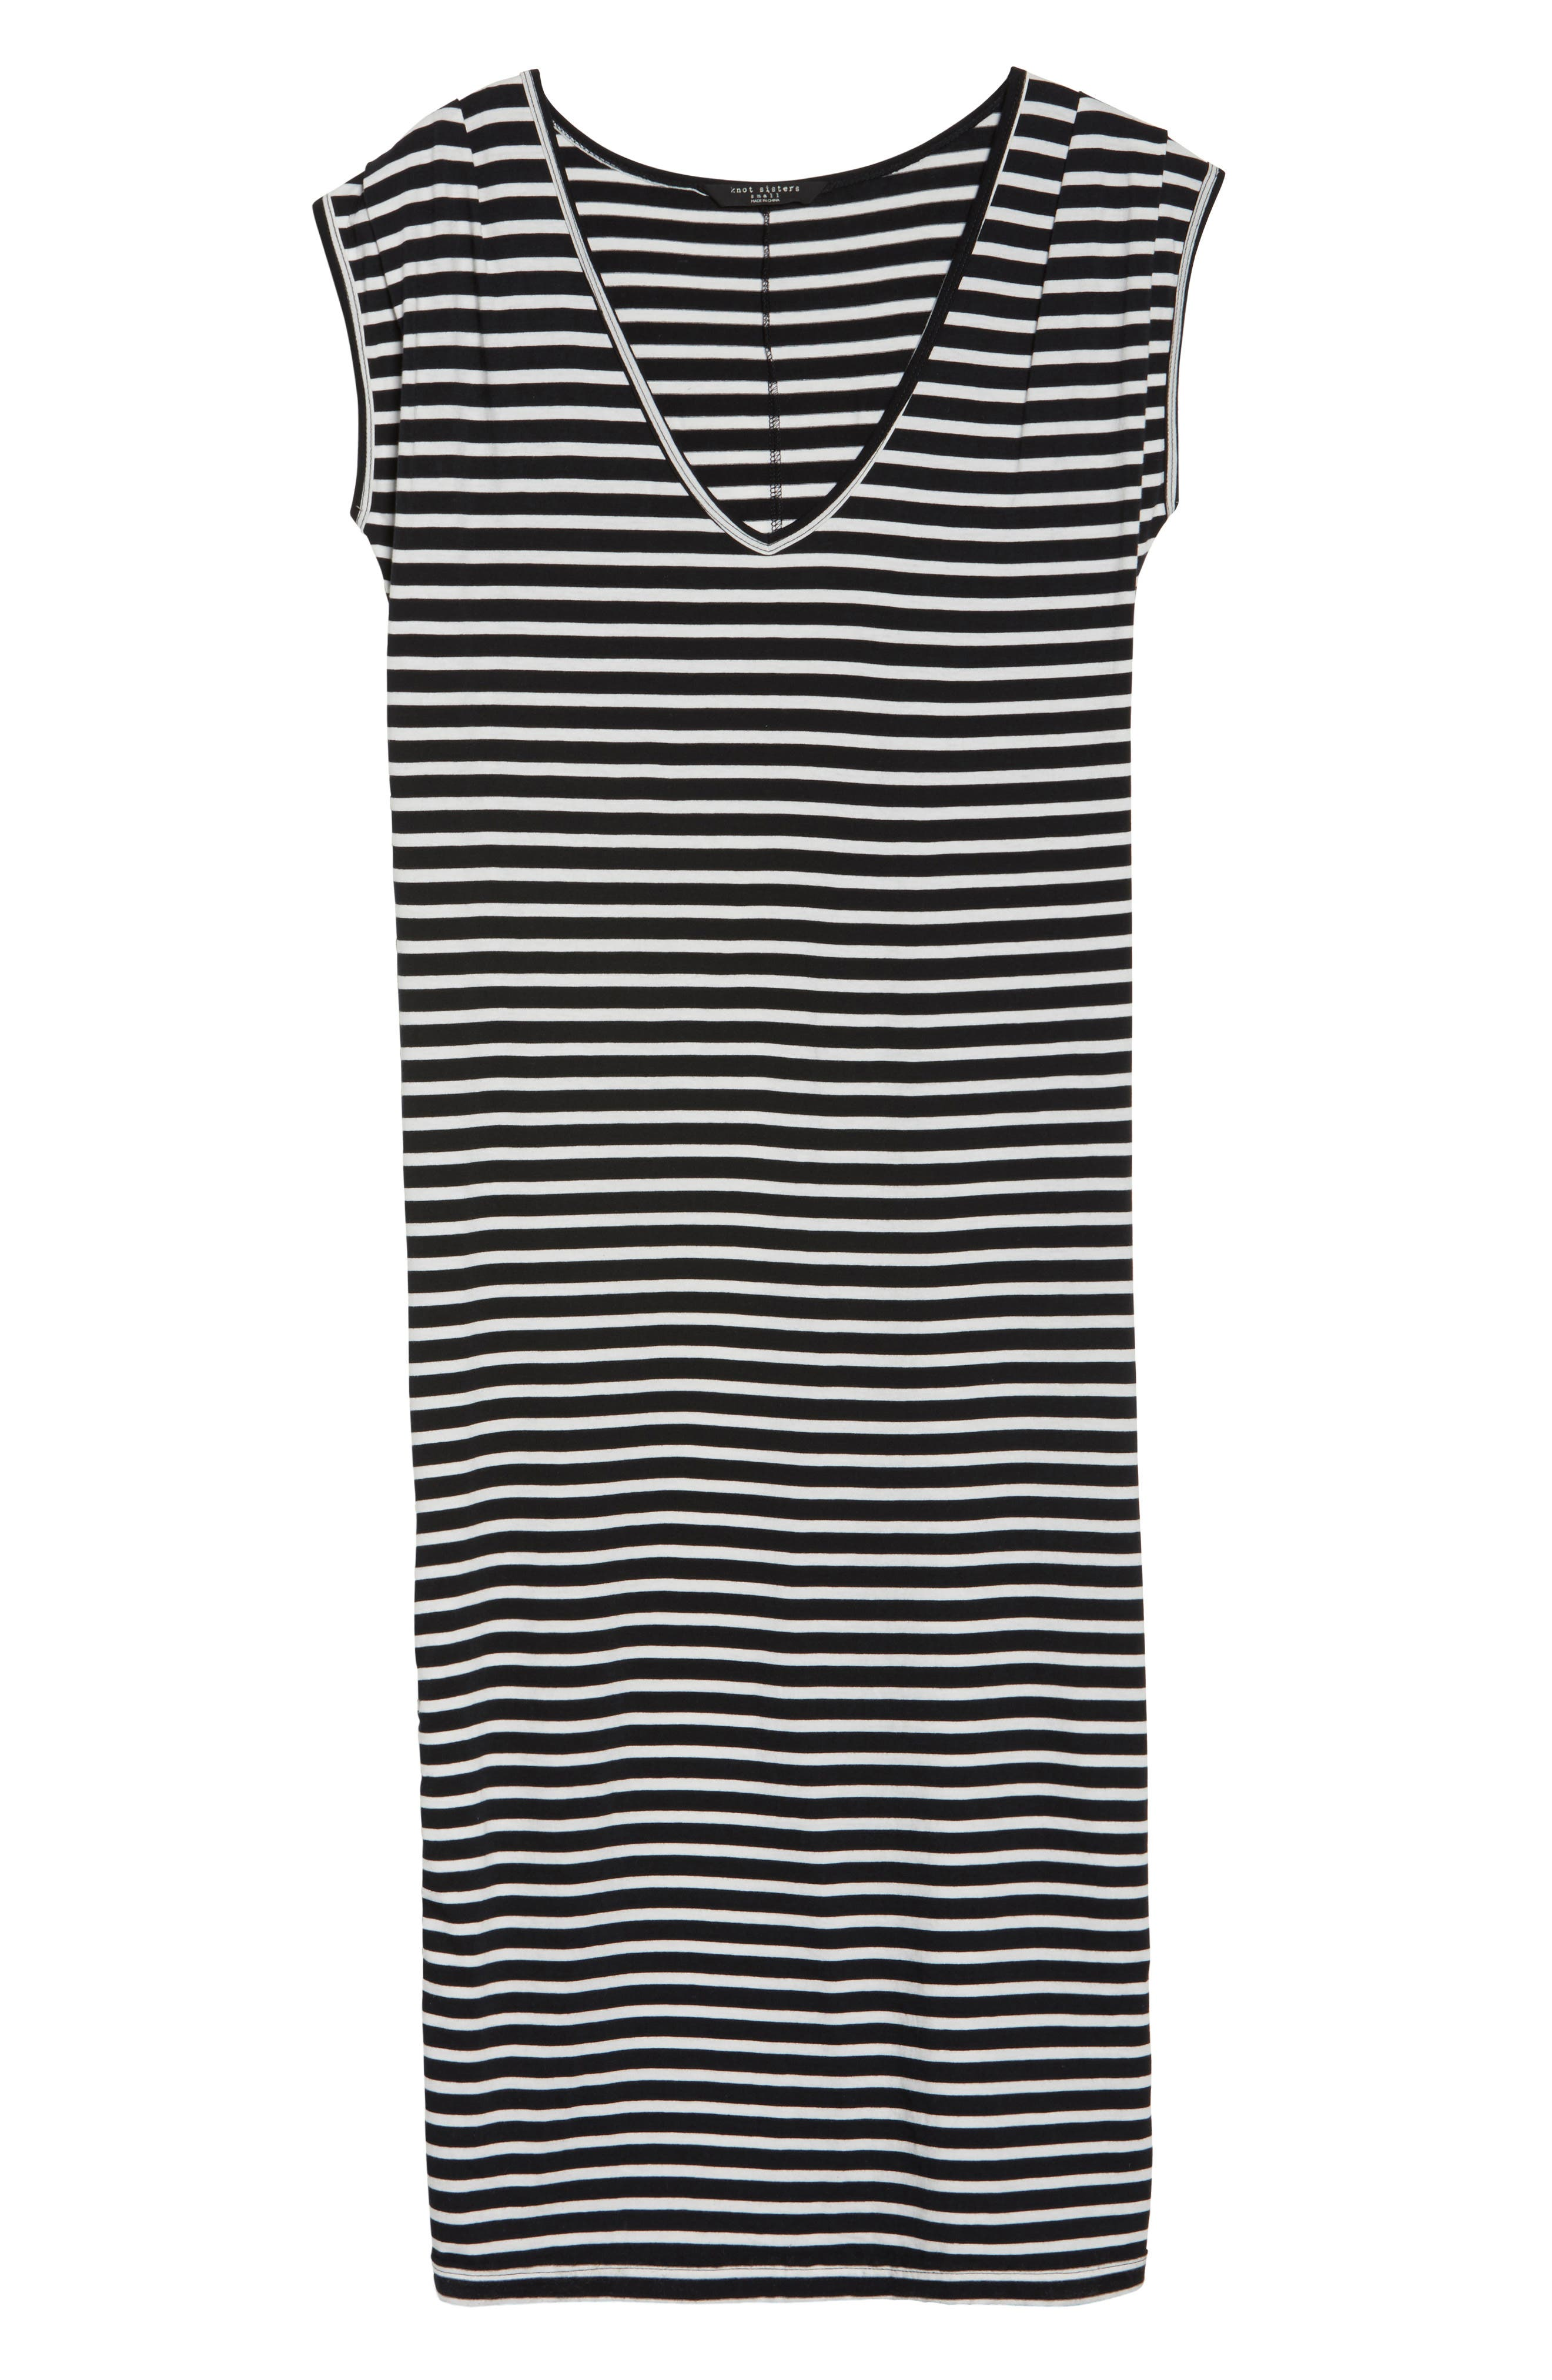 Solana Stripe Knit Midi Dress,                             Alternate thumbnail 6, color,                             Black White Stripe